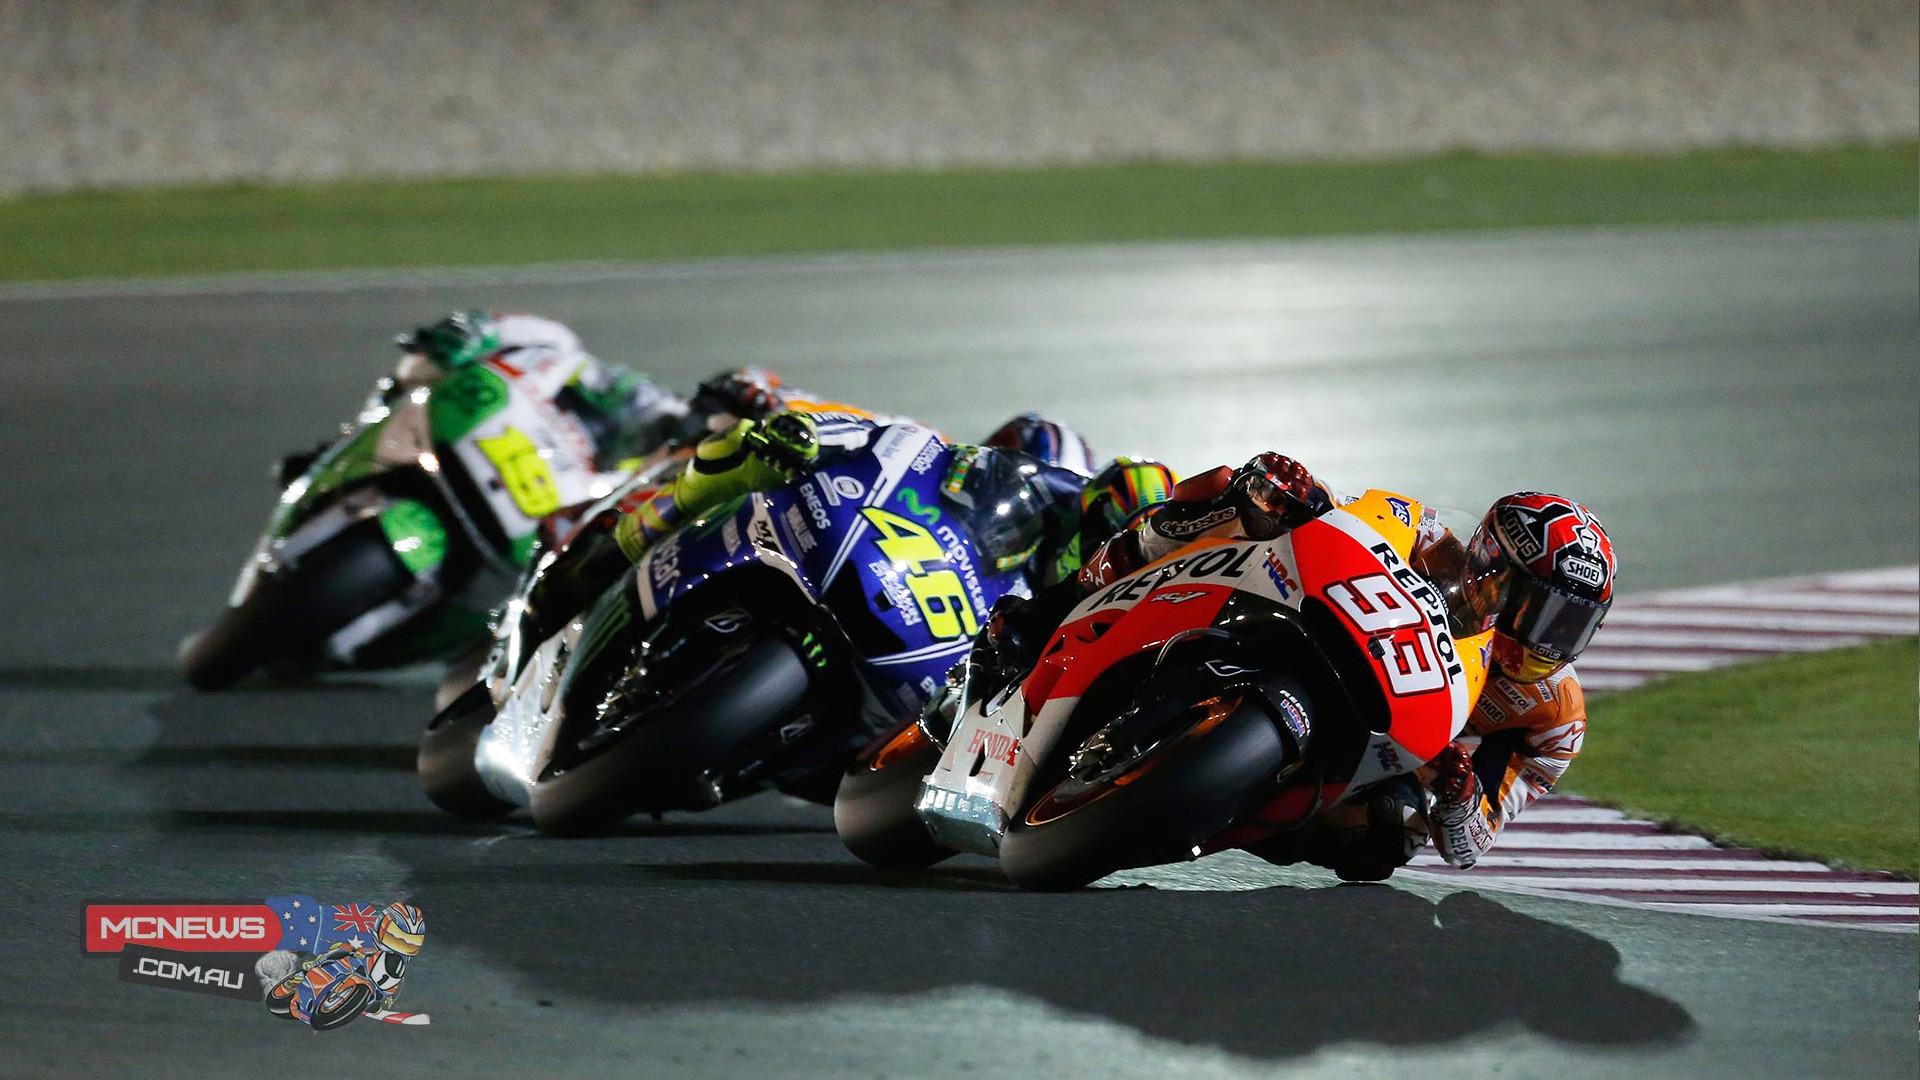 motogp 2014 wallpaper hd MotoGP 2014 Wallpaper HD